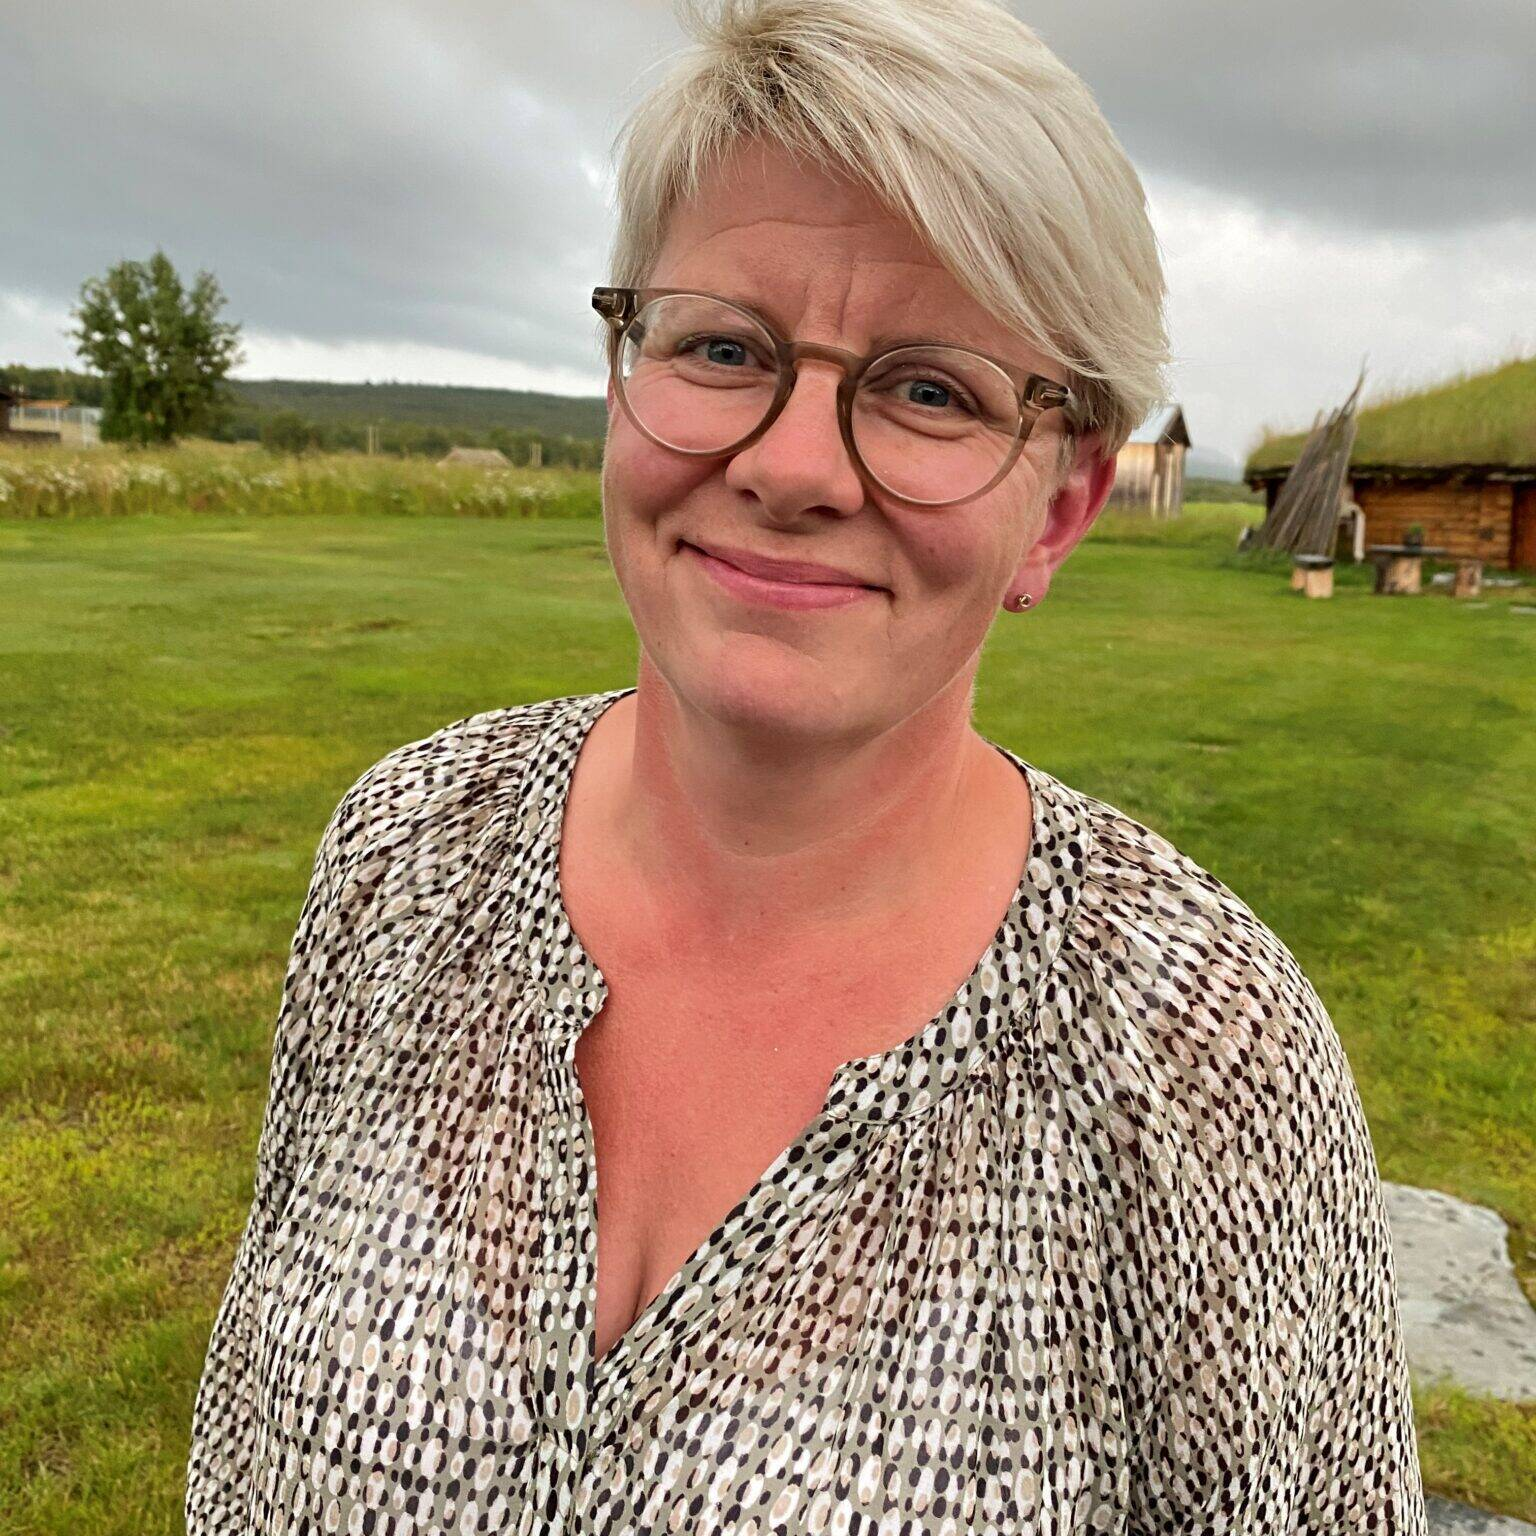 Marit Haugen, styreleder Tine. Foto: Ren Røros / Torgeir Anda.